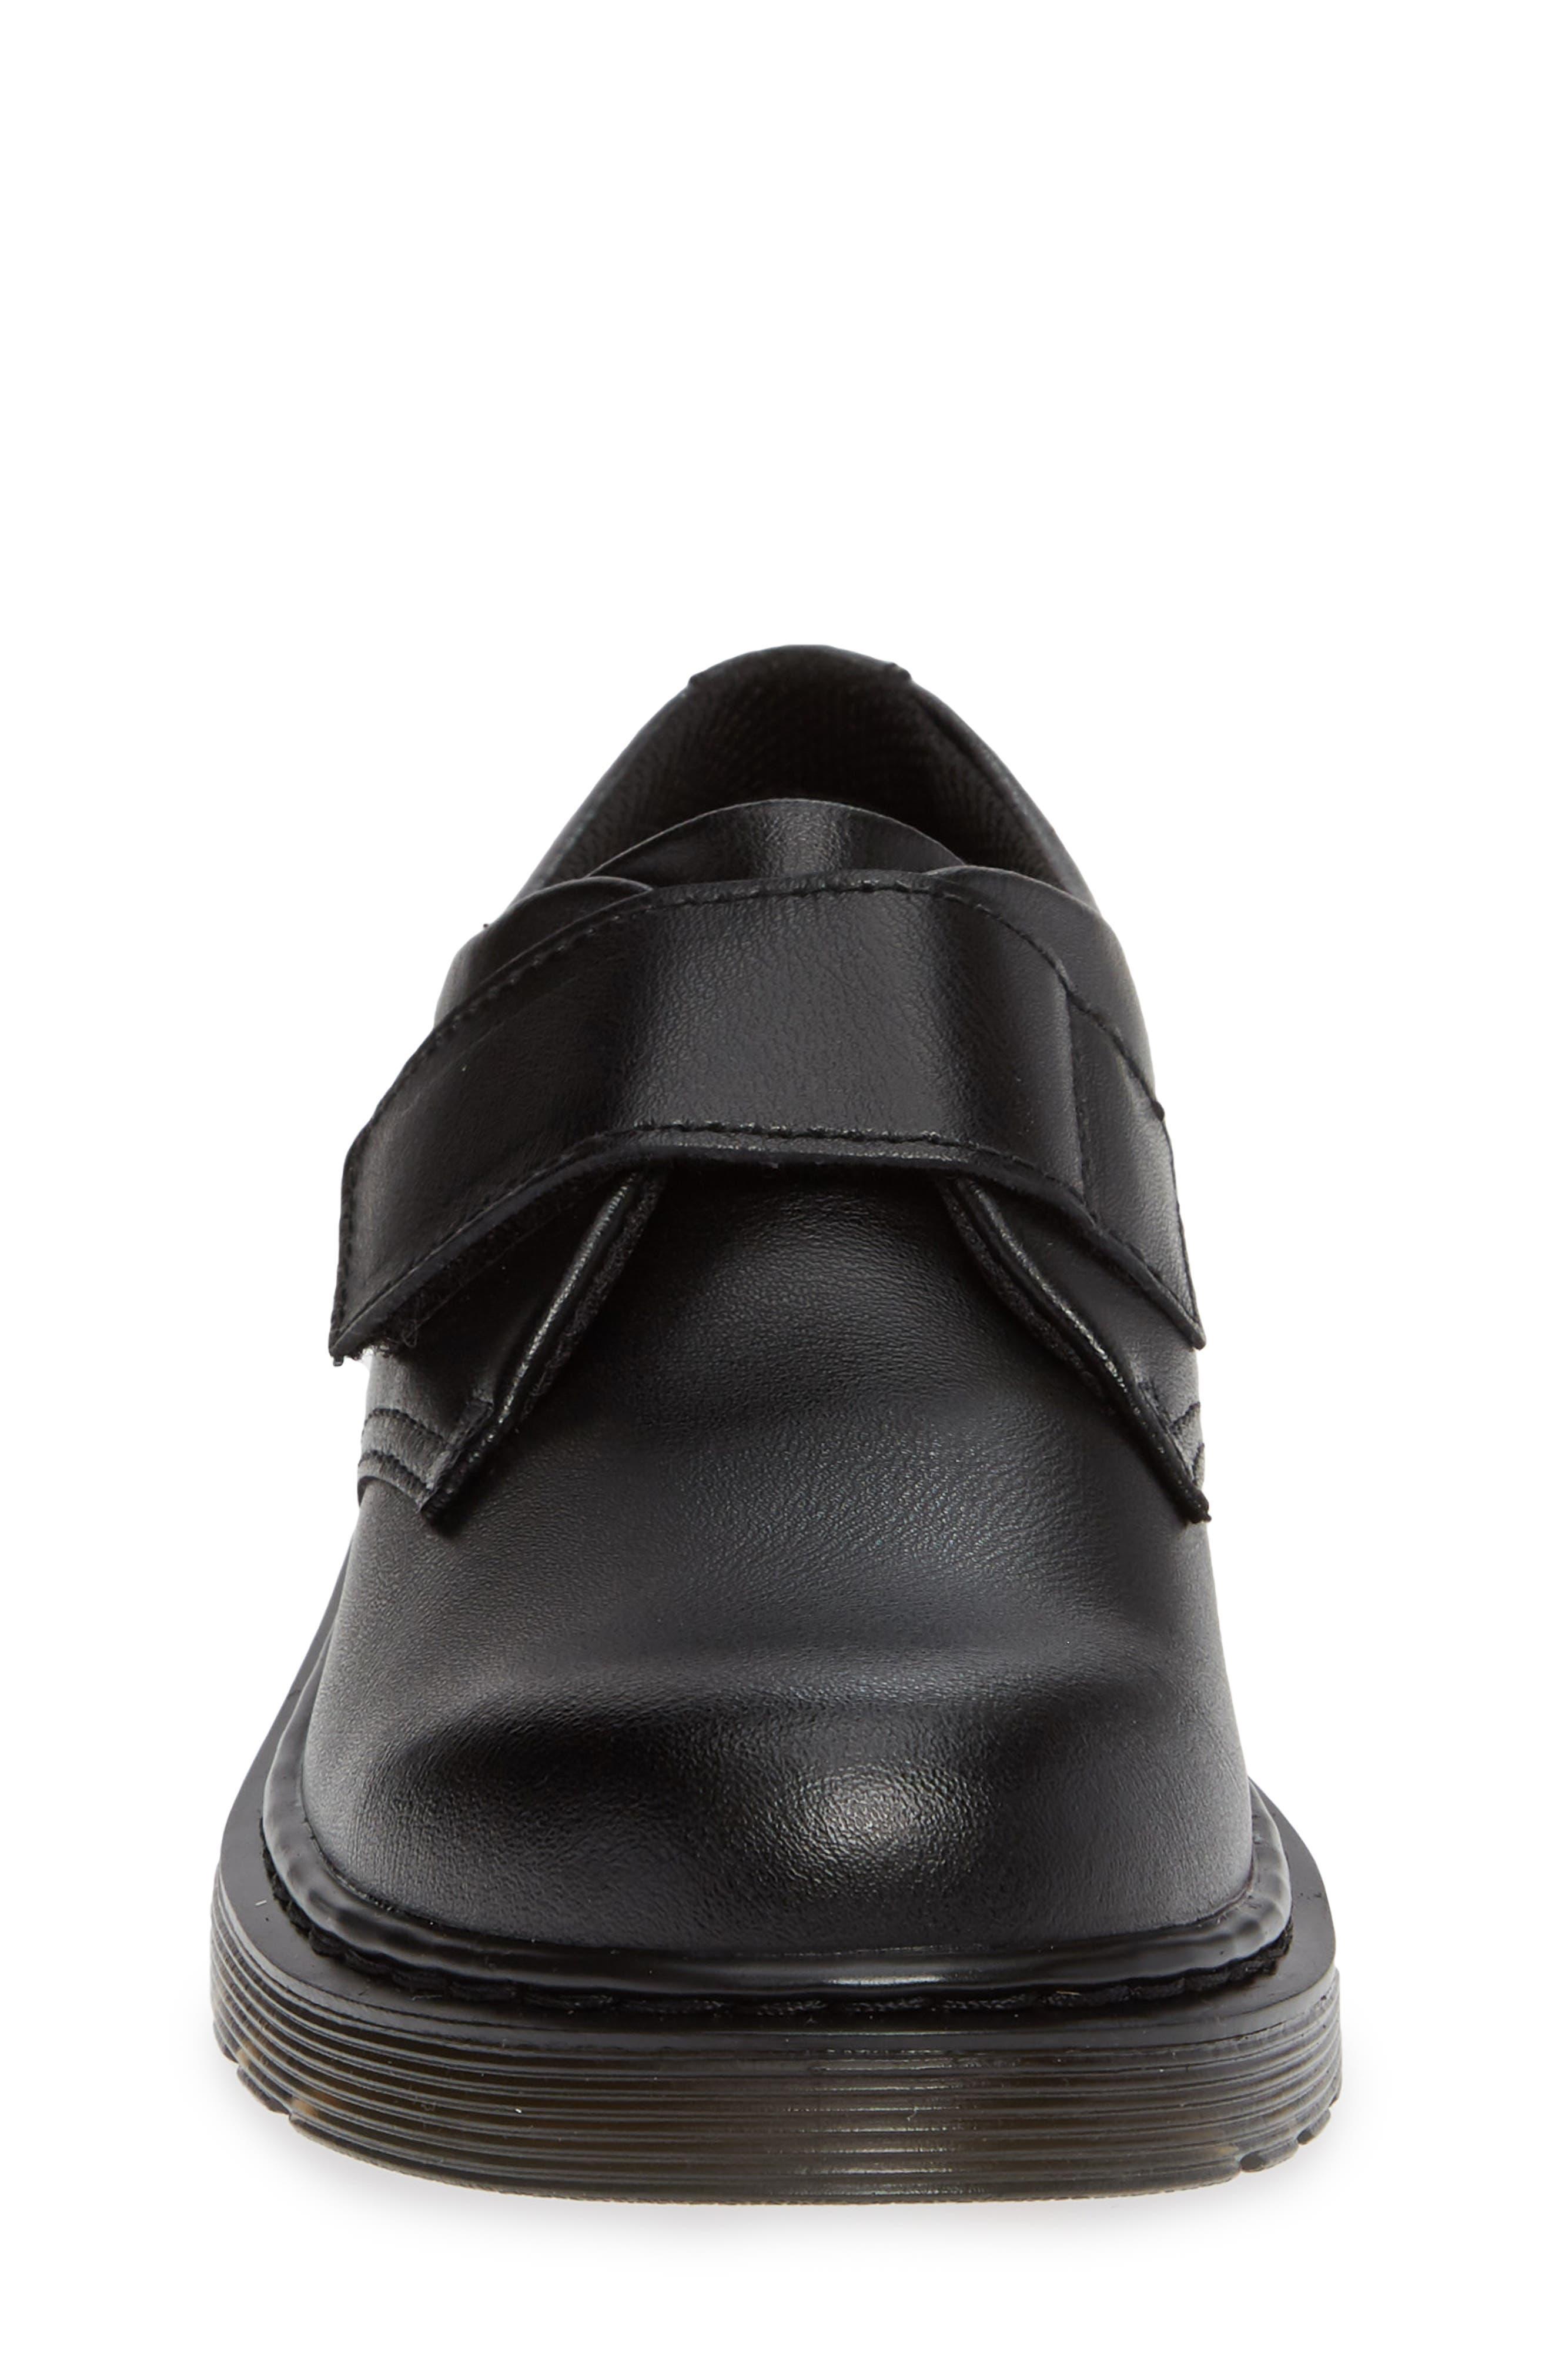 Strap Shoe,                             Alternate thumbnail 4, color,                             BLACK